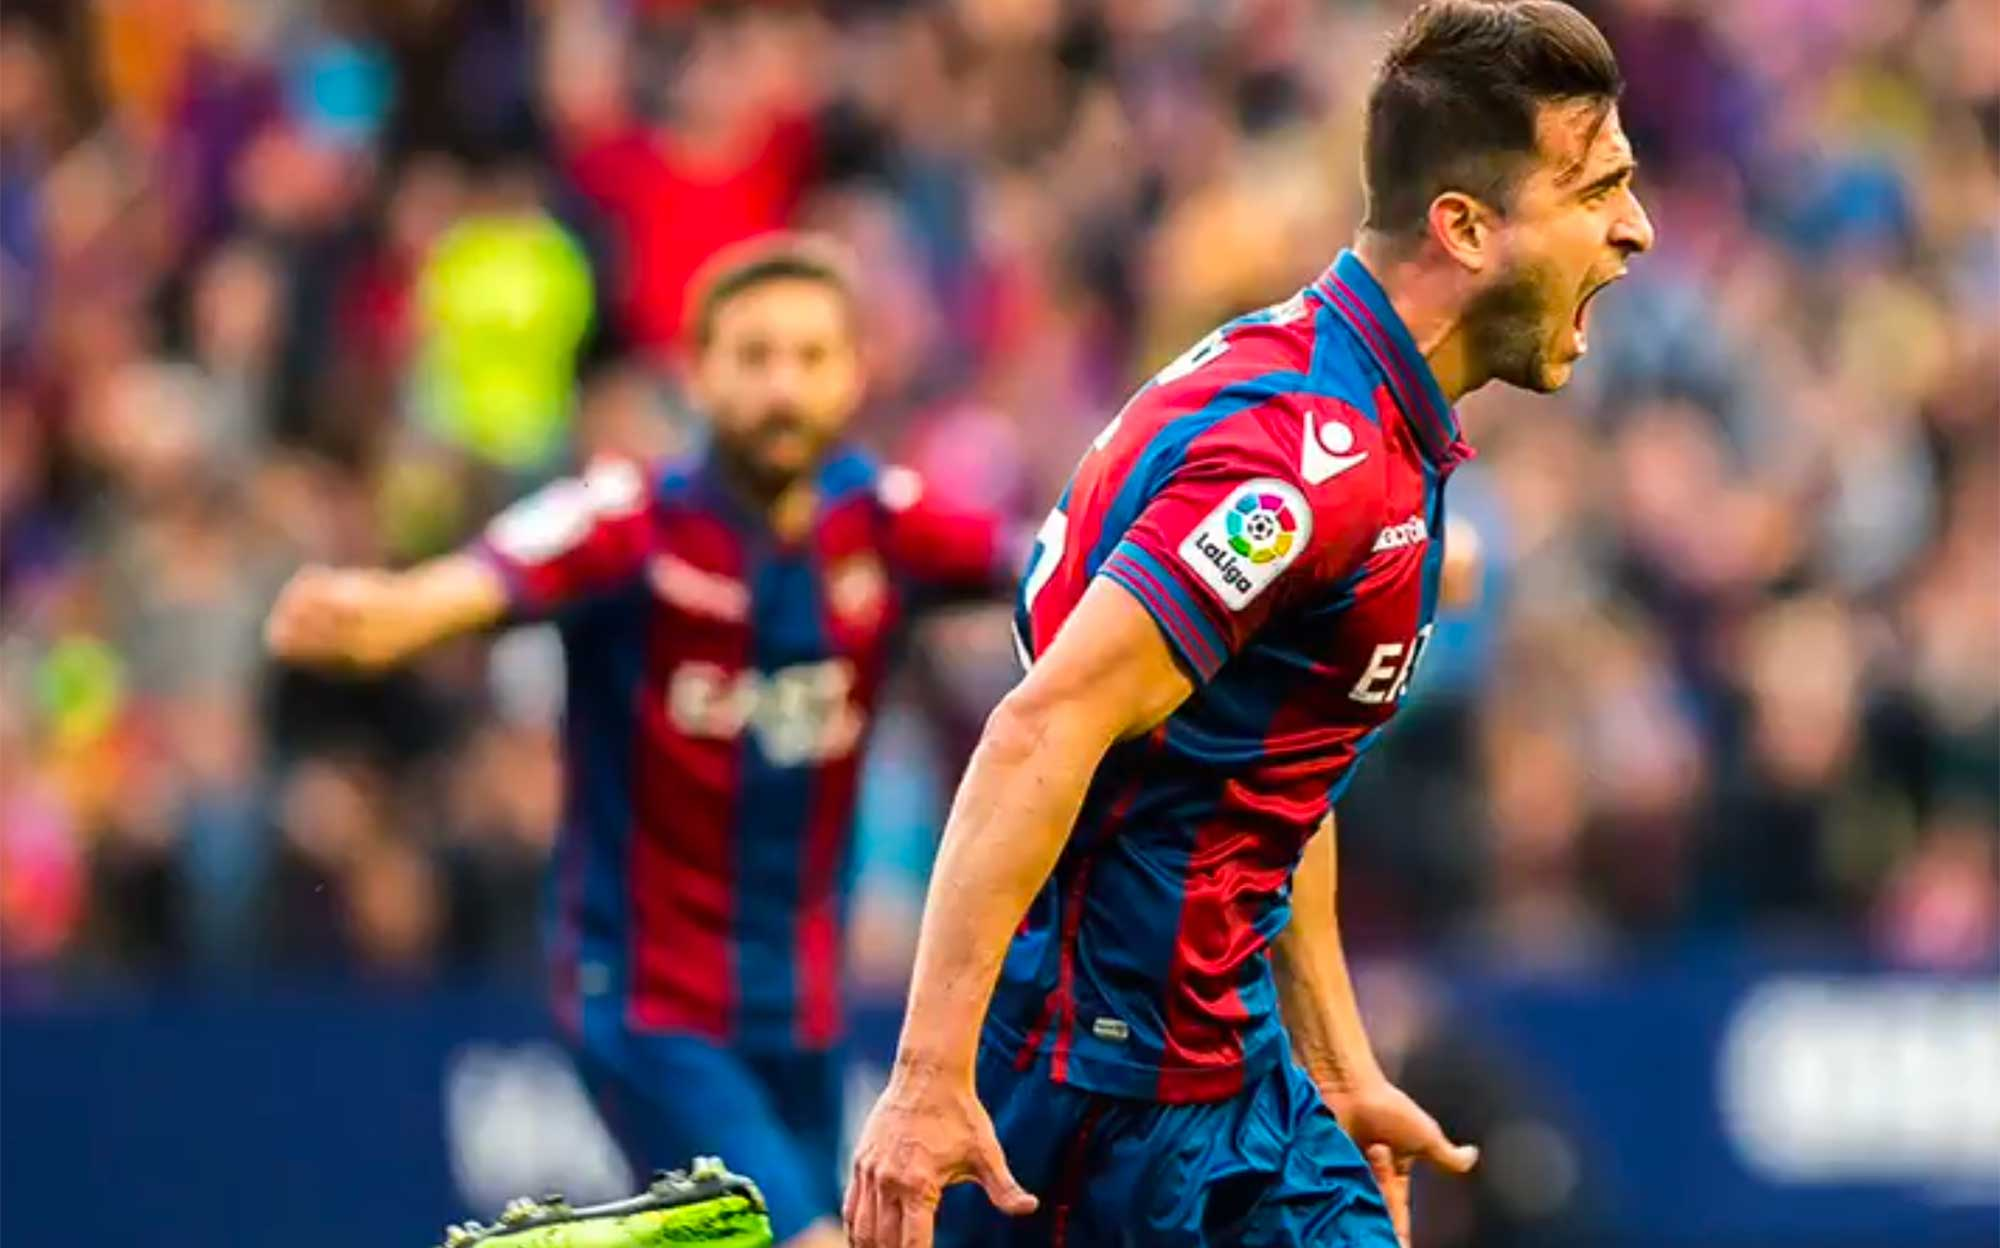 Imagen de Sergio Postigo celebrando el gol